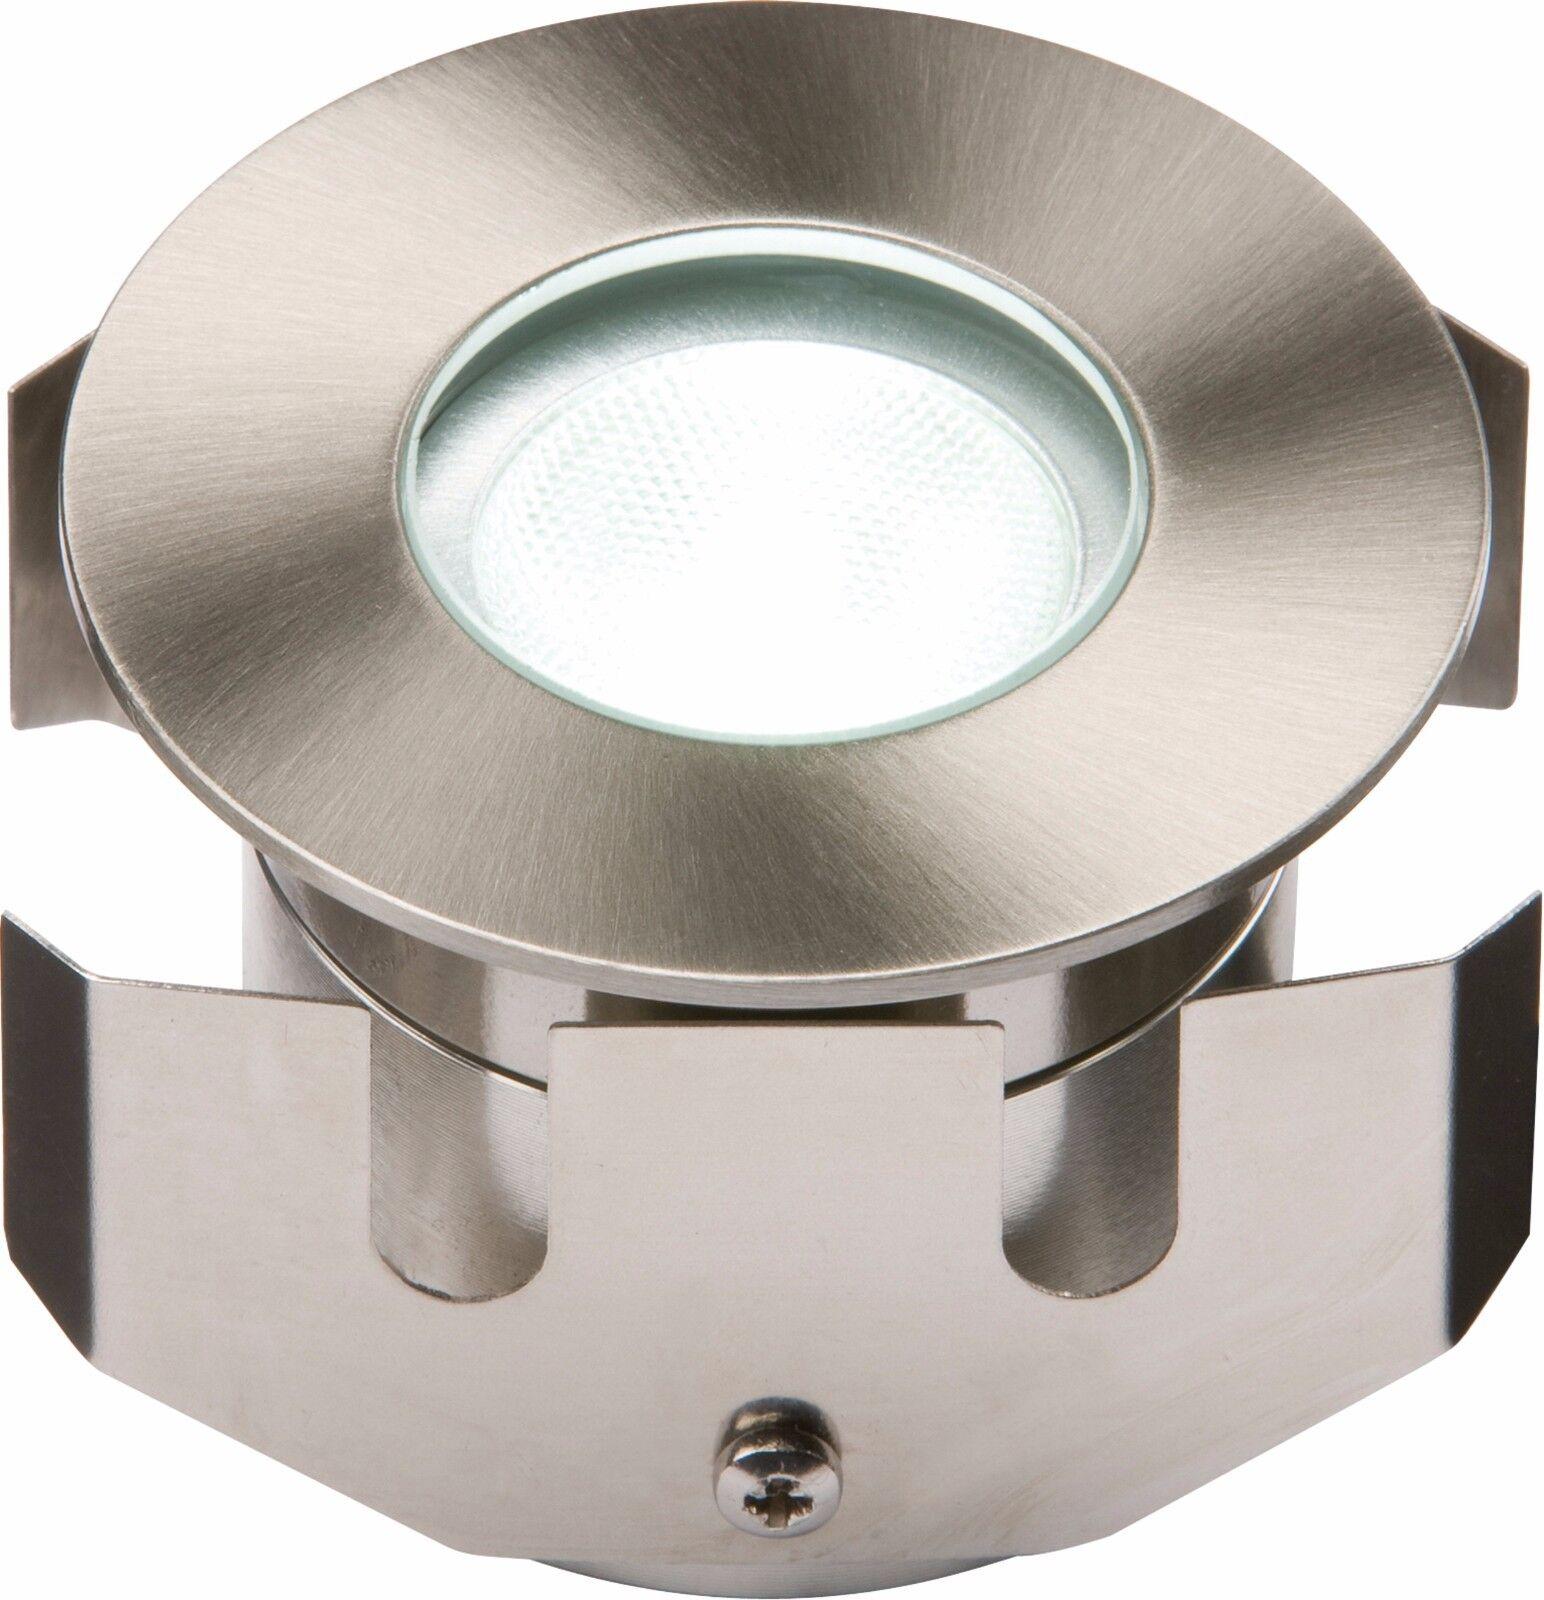 Knightsbridge 1W Bianco Bassa Tensione LED in acciaio inox rivestimento WALKOVER LUCE